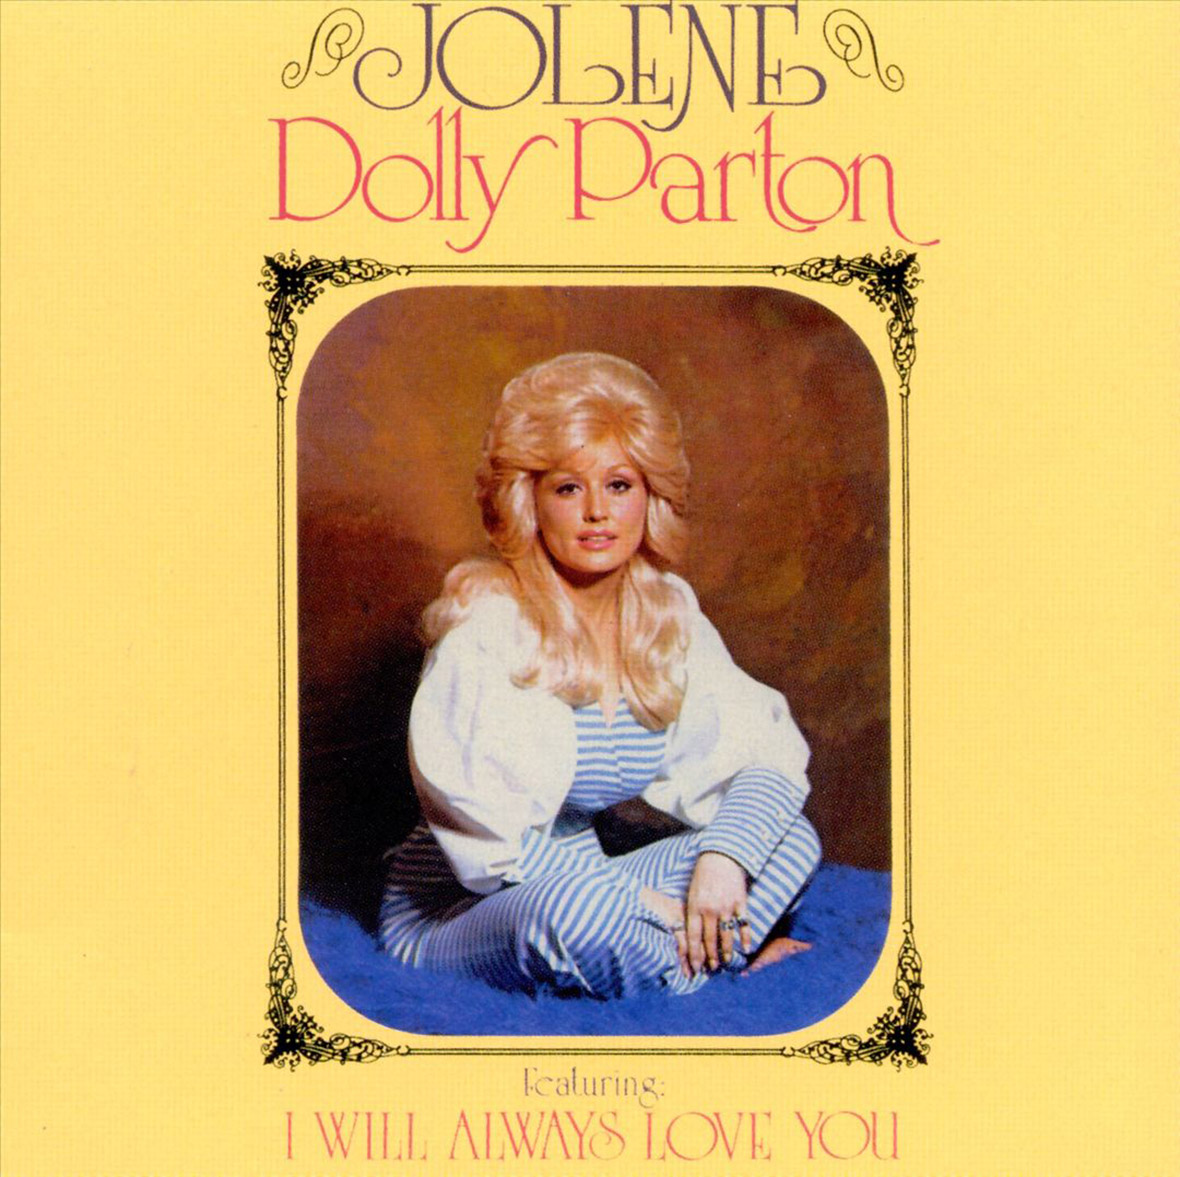 dolly-parton-turns-70-1.jpg